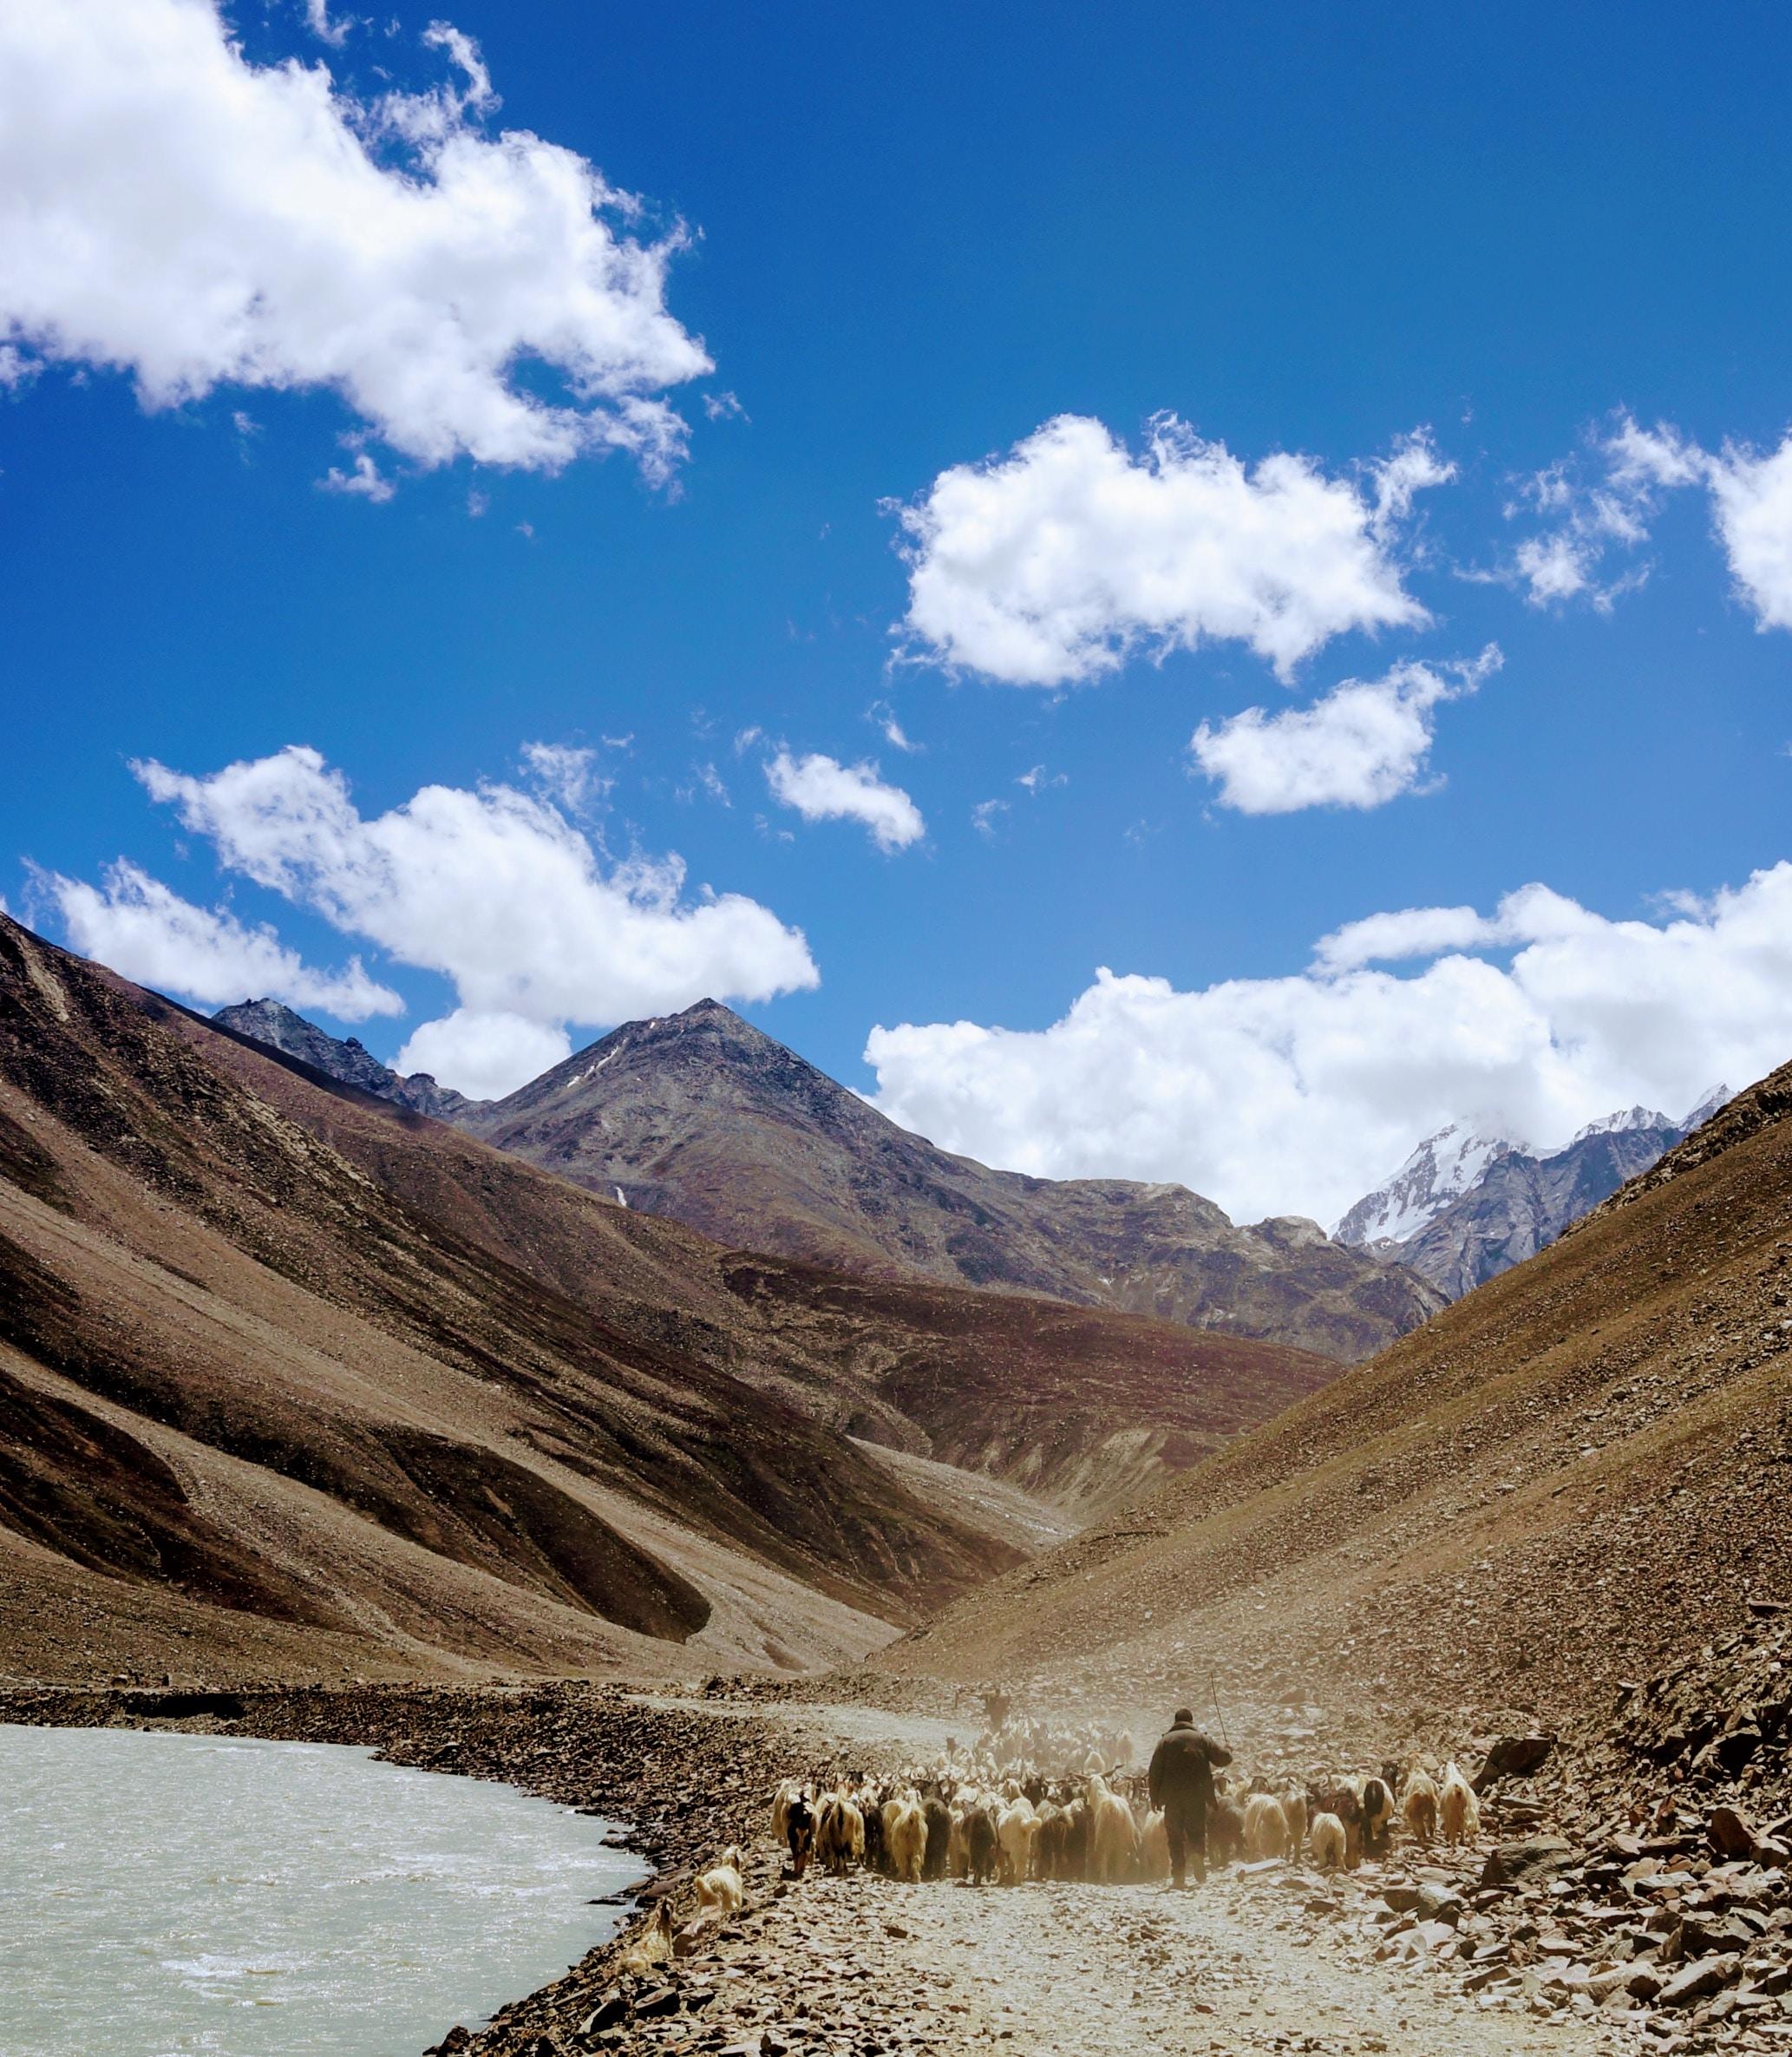 herd on sheep on brown mountain